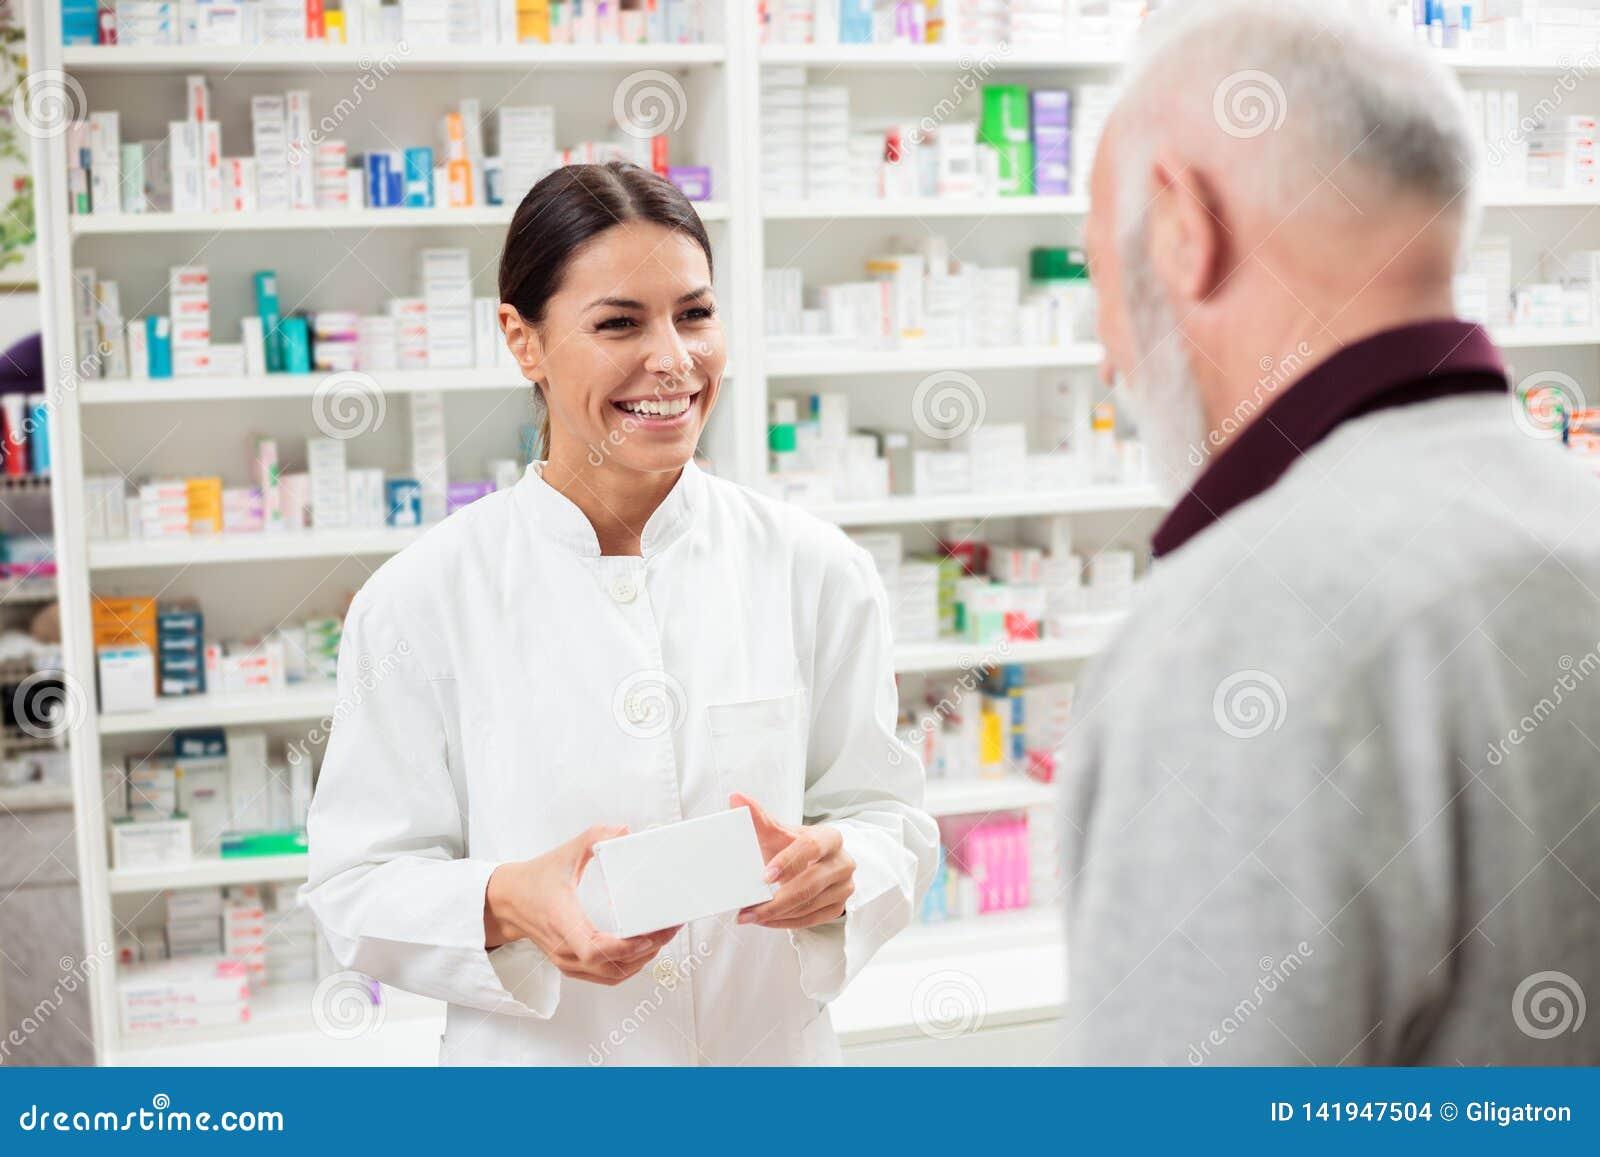 Happy female pharmacist giving medications to senior male customer